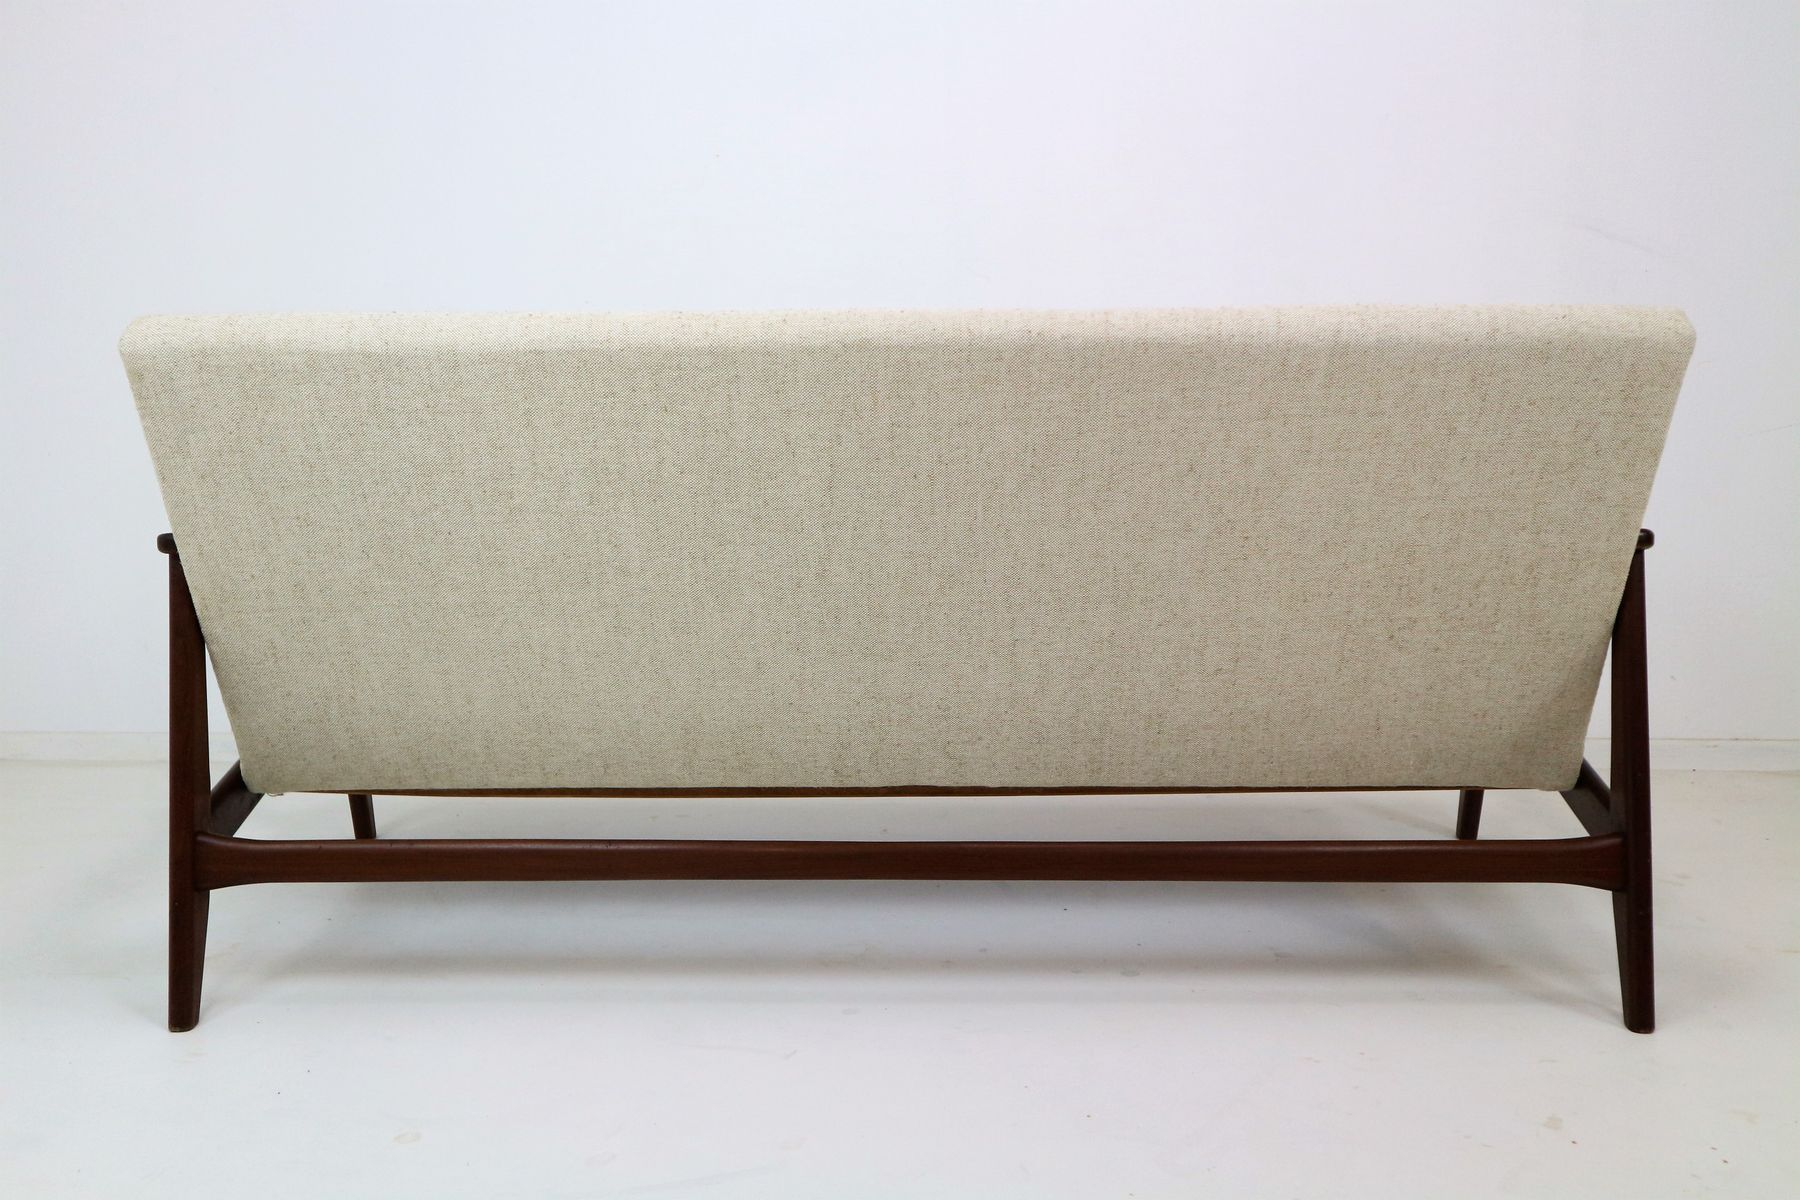 sofa for van singapore leather bed loveseat mid century teak by louis teeffelen wébé